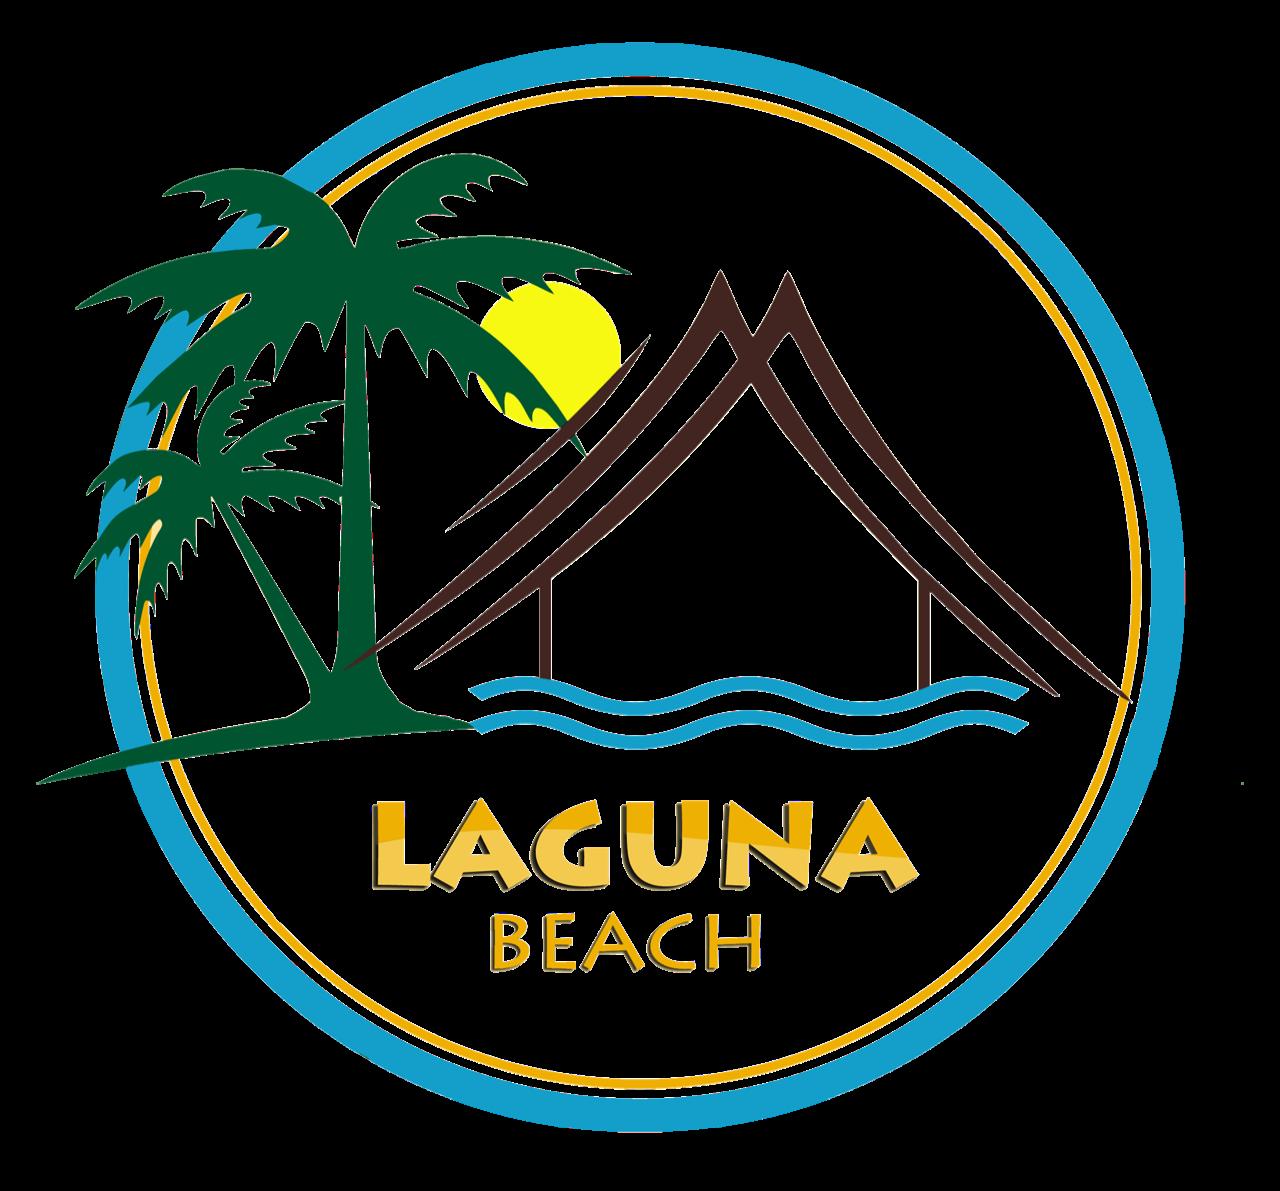 logo LAGUNA BEACH